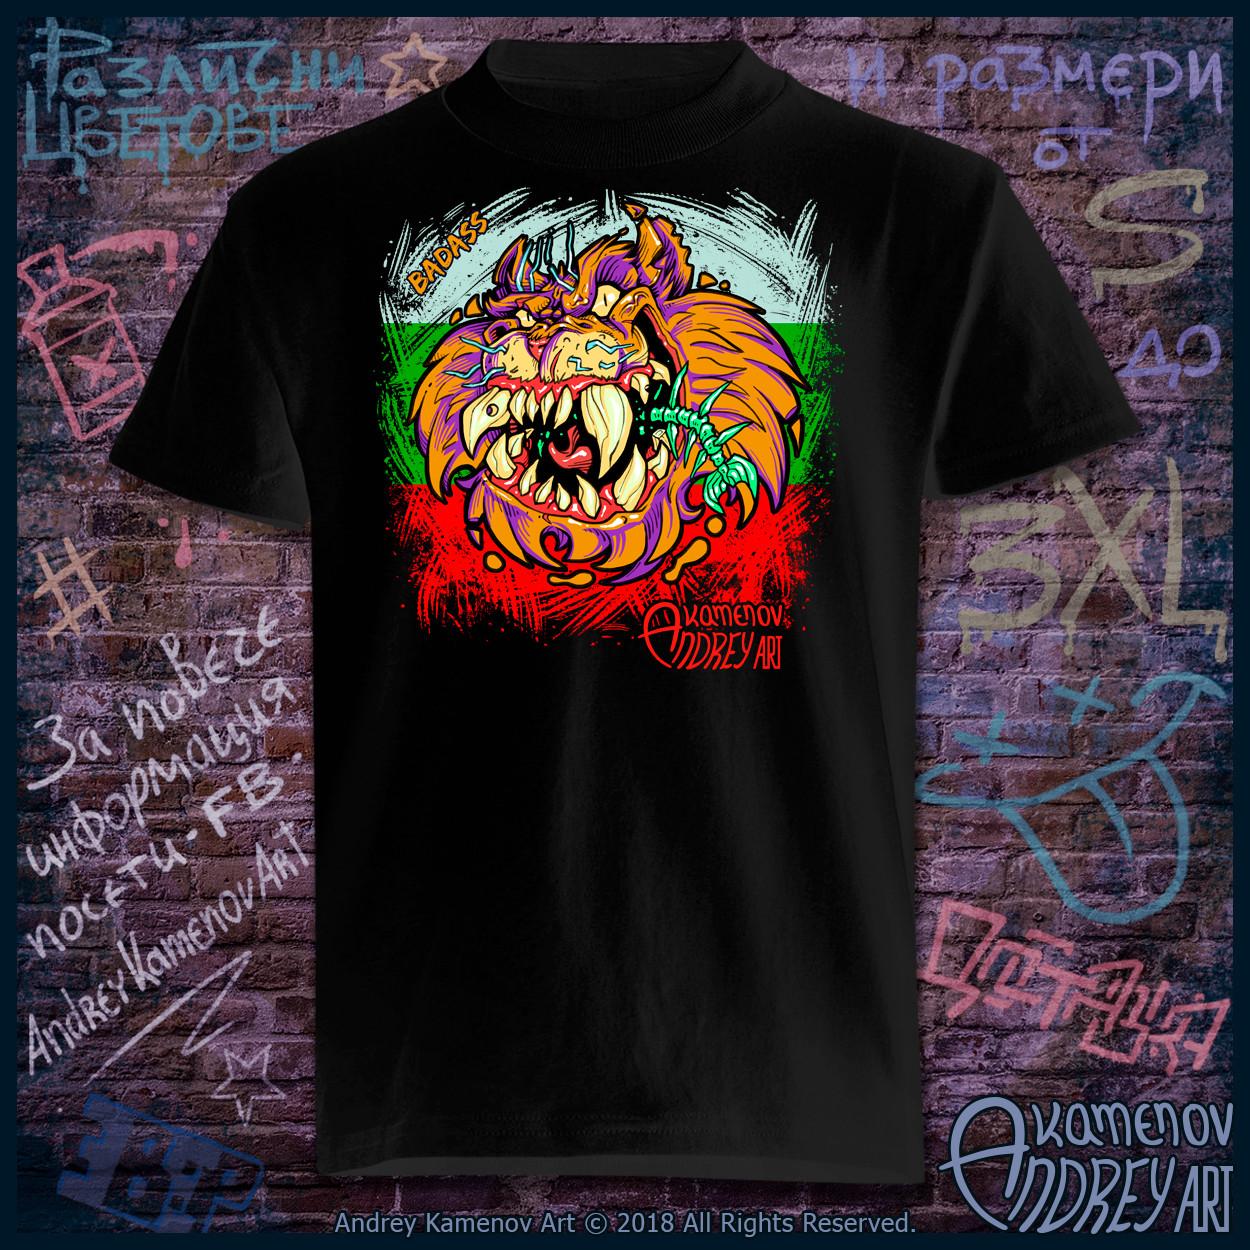 Andrey kamenov badass cat t shirt bg 01